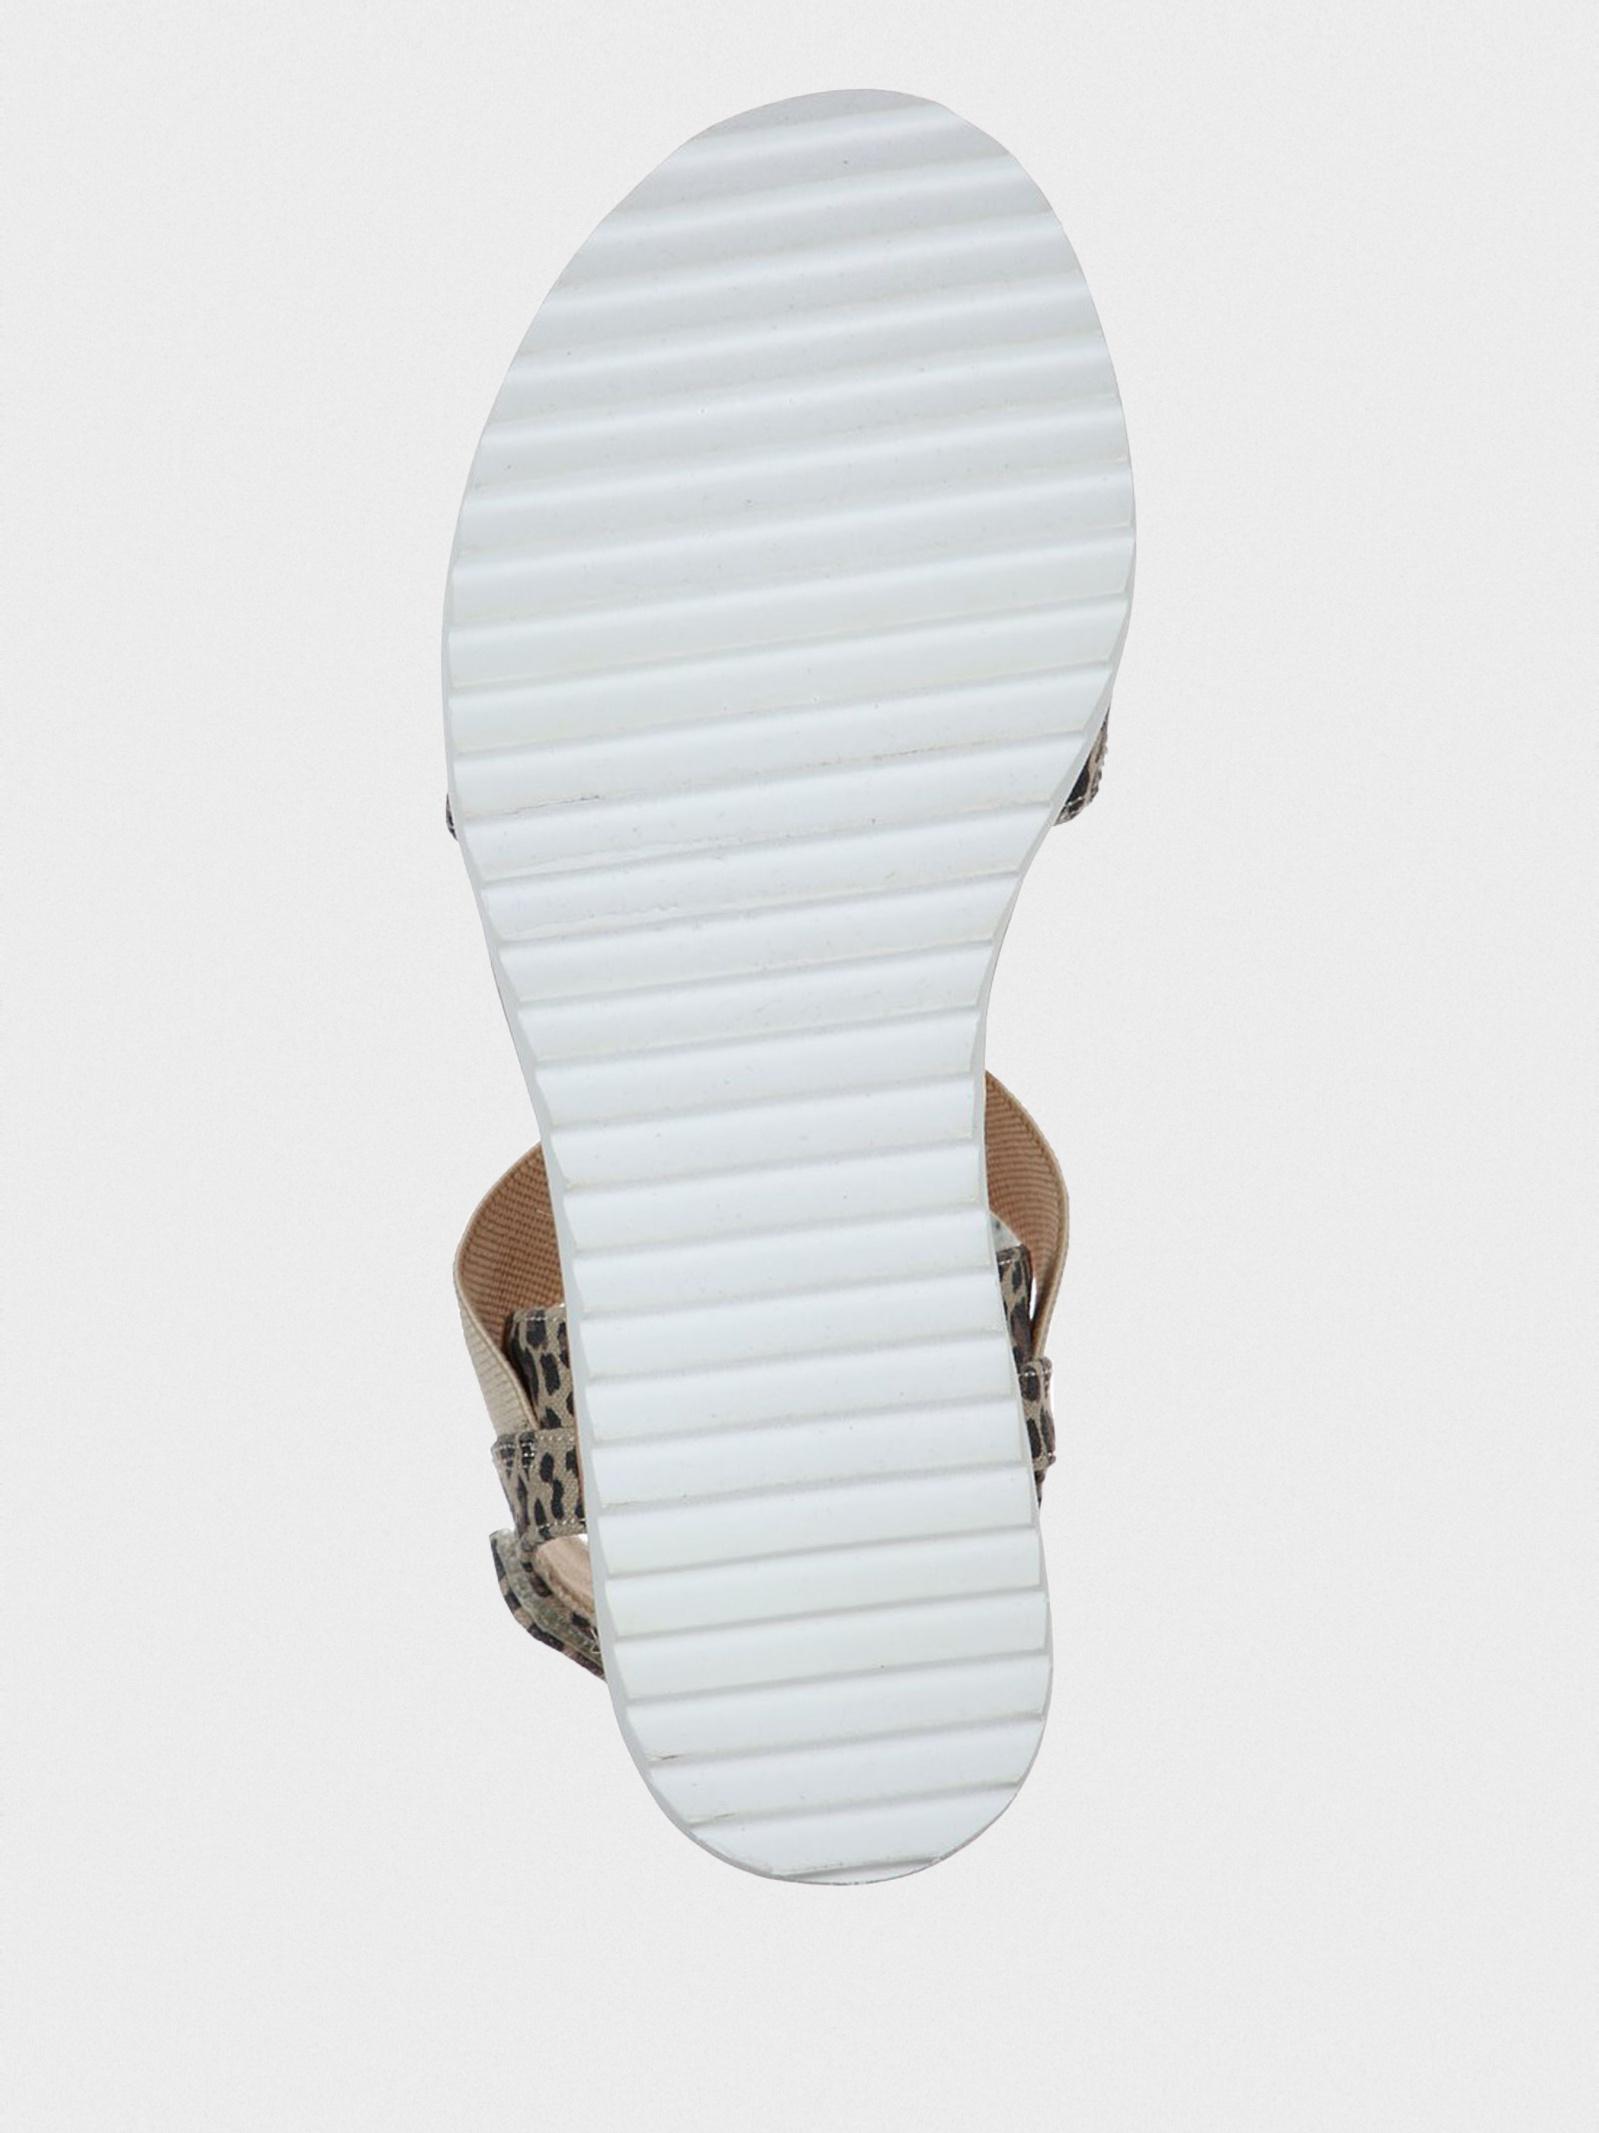 Сандалии для женщин Skechers Bob's KW5507 купить обувь, 2017